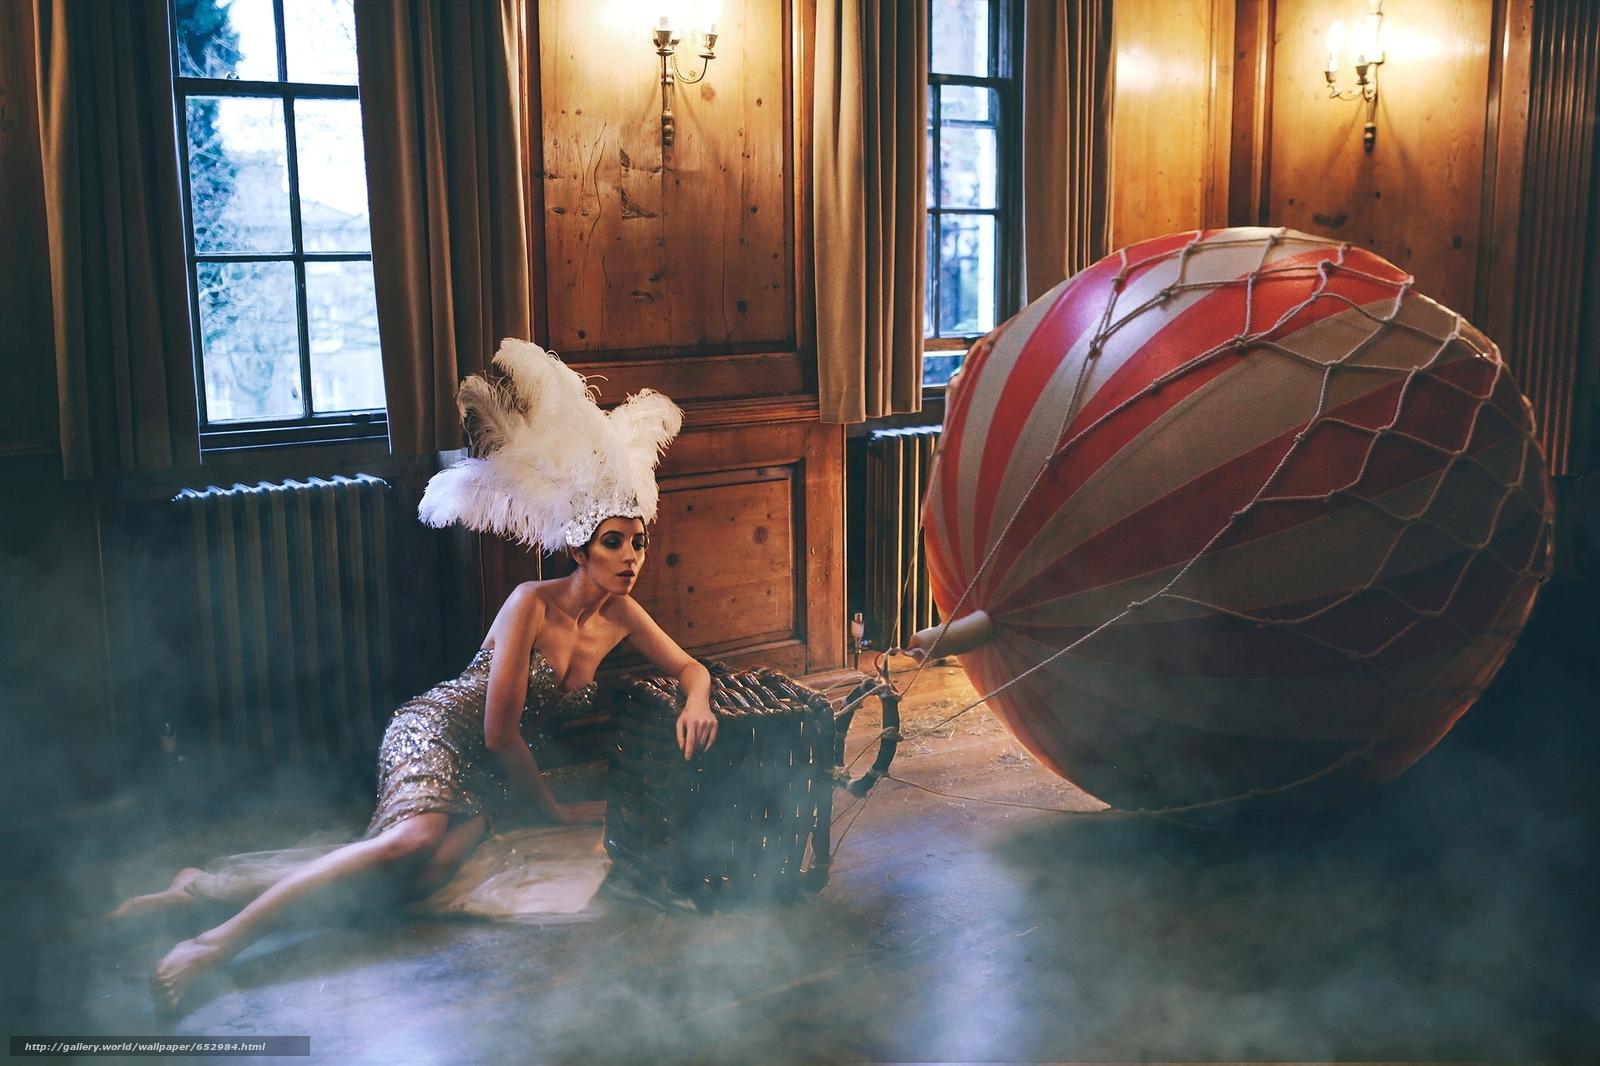 Marianna Saver, model, plumage, balloon, floor, situation